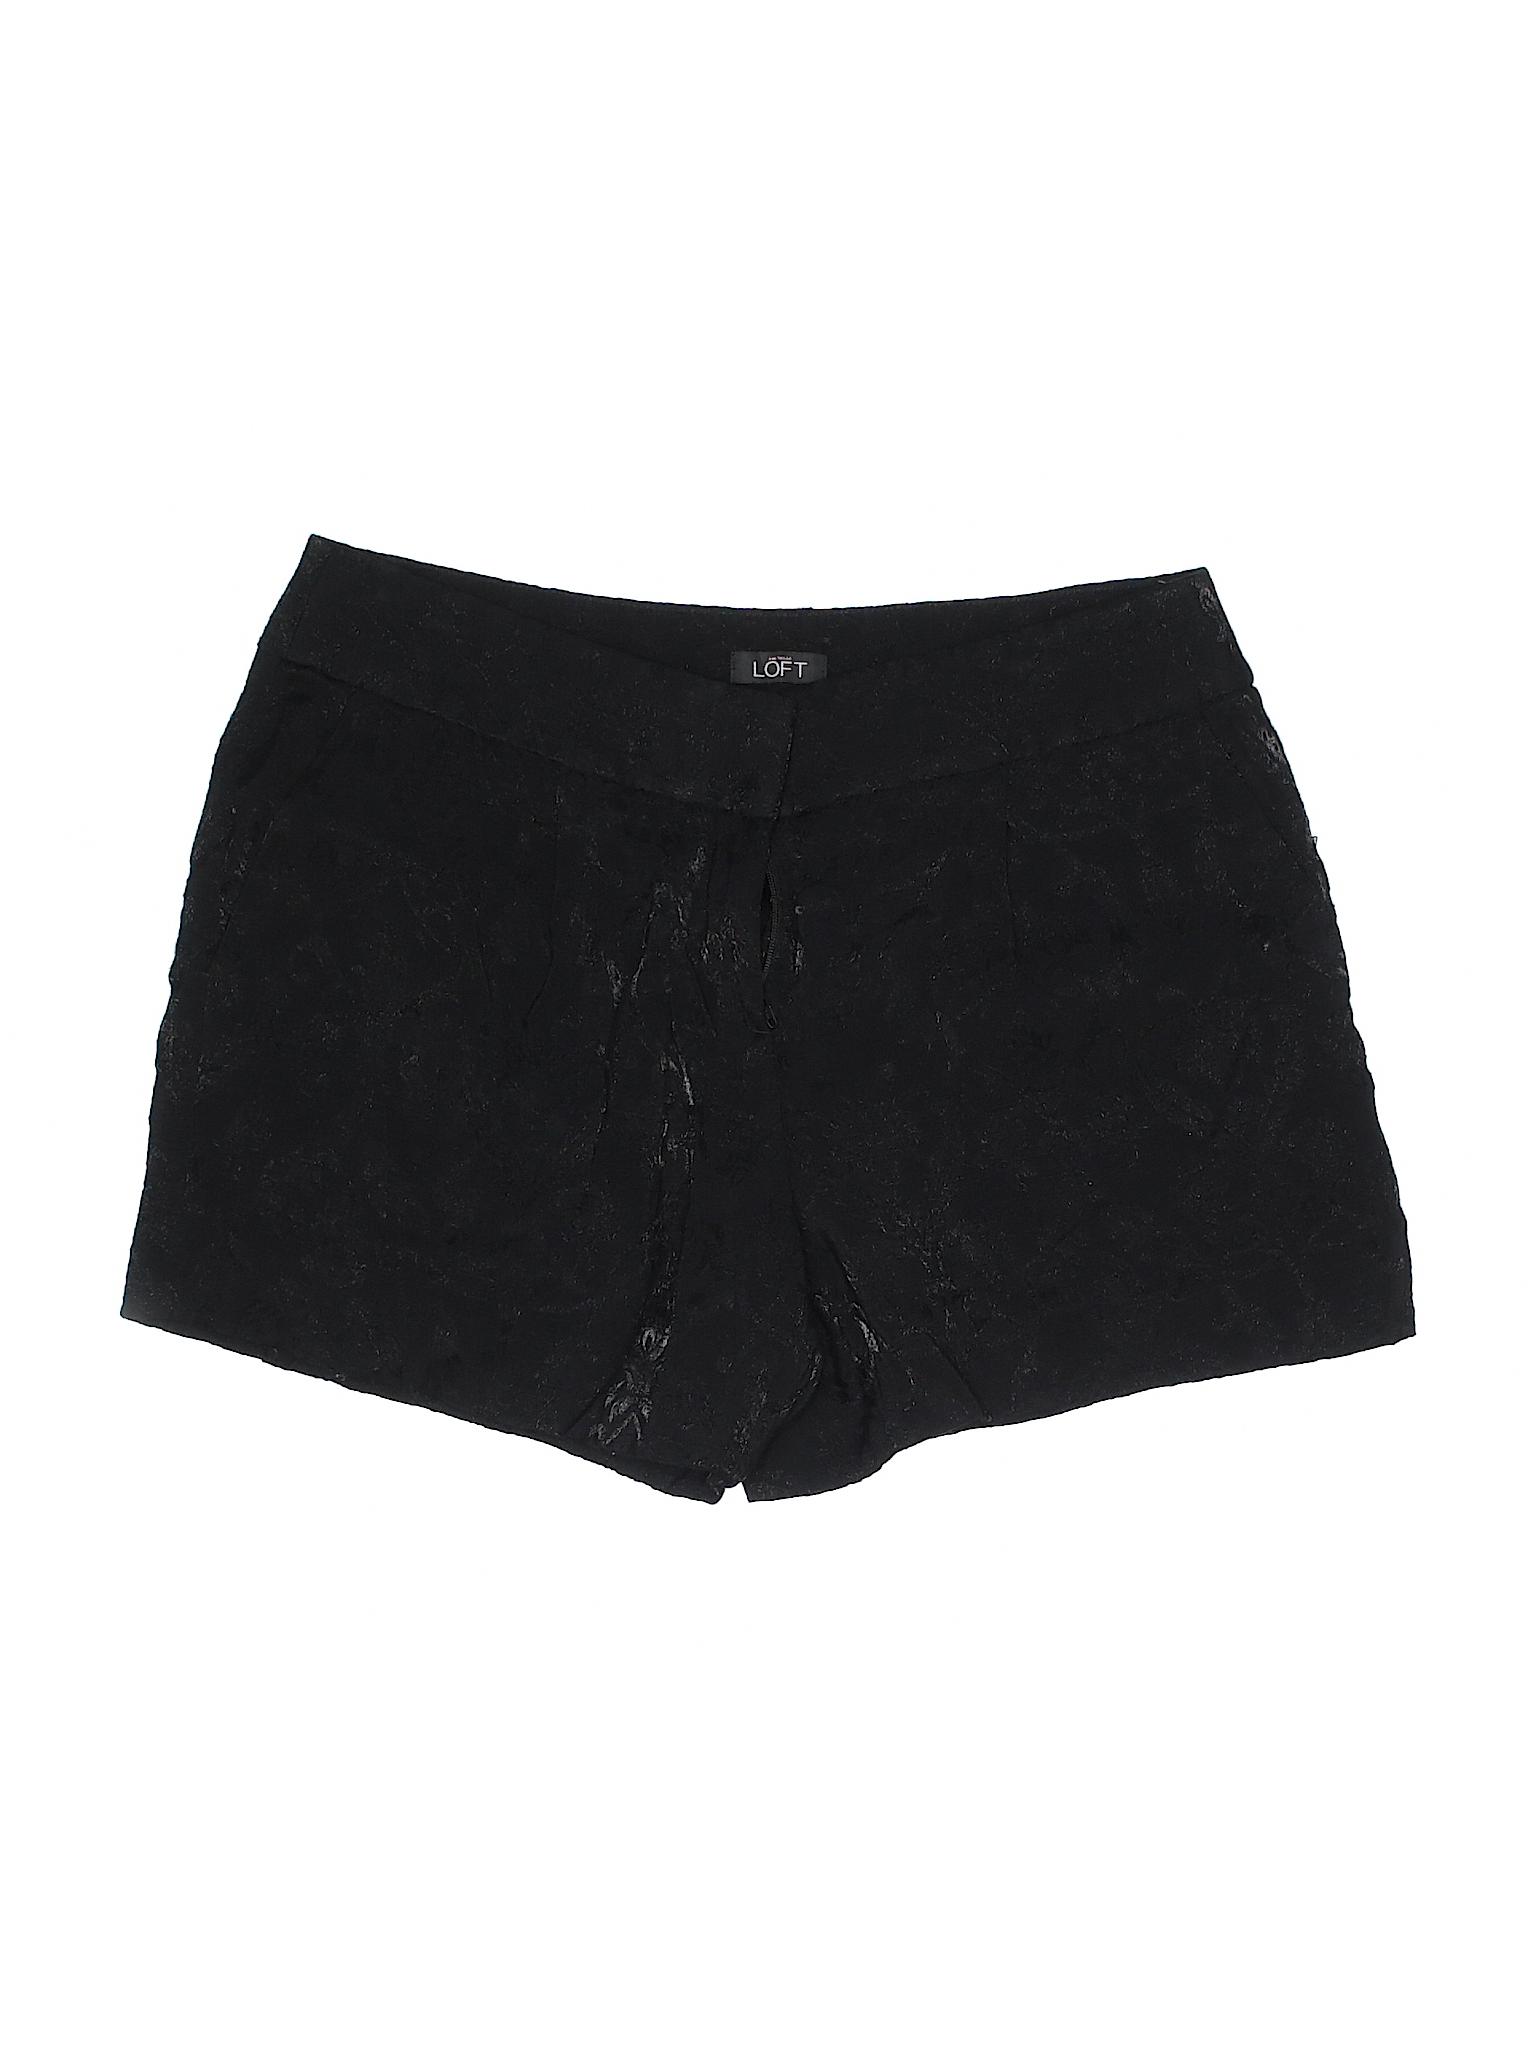 Taylor Ann LOFT Dressy Shorts Boutique 5qRSzS